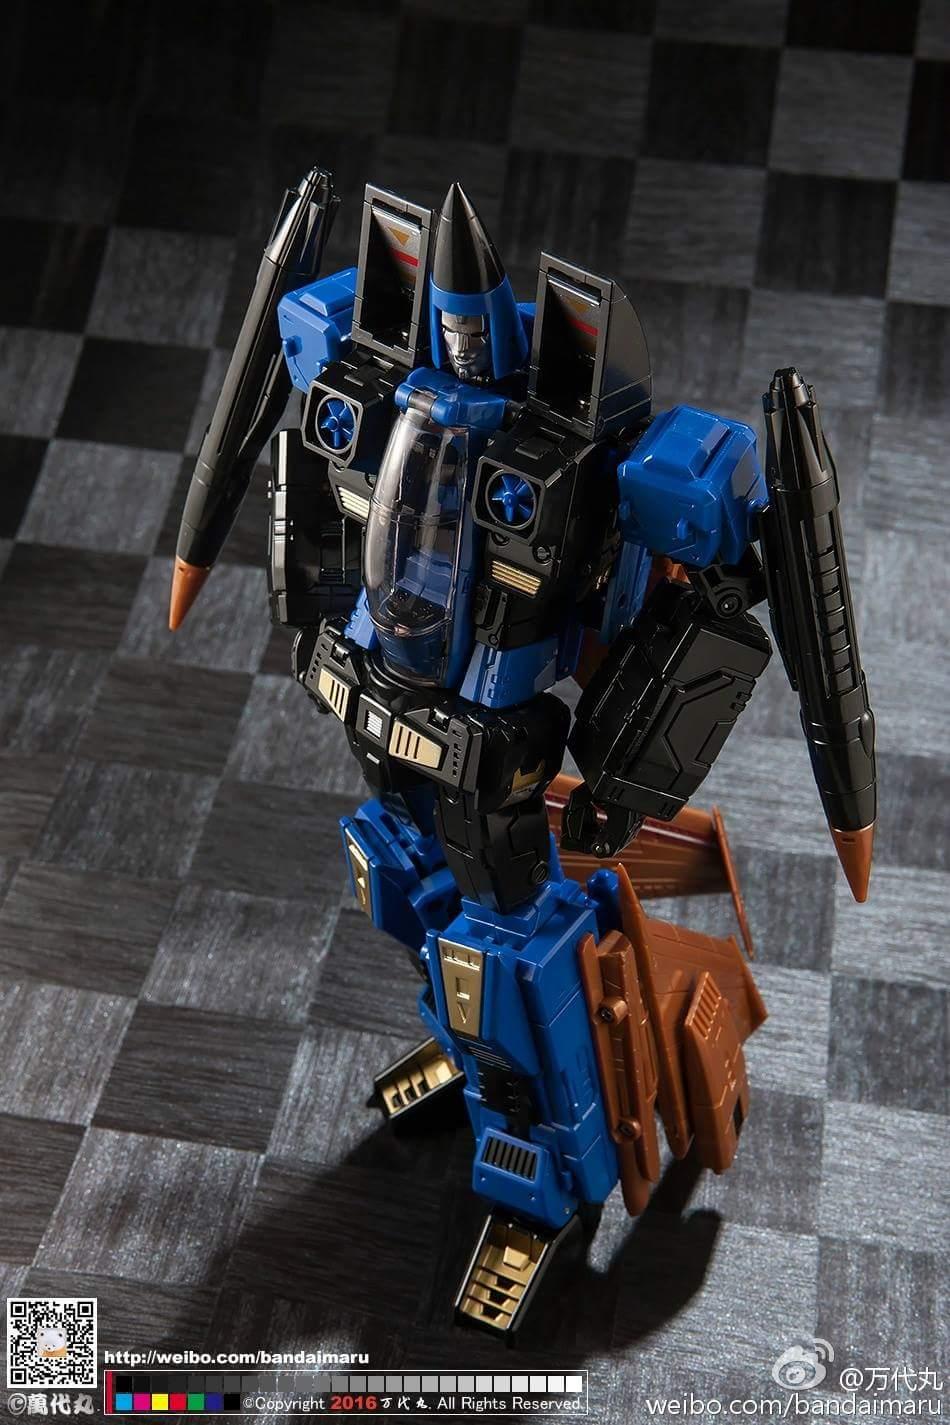 [ToyWorld] Produit Tiers - TW-M02A Combustor (Ramjet/Statoréacto), TW-M02B Assault (Thrust/Fatalo), TW-M02C Requiem (Dirge/Funébro) - Page 3 APBHRQ1E